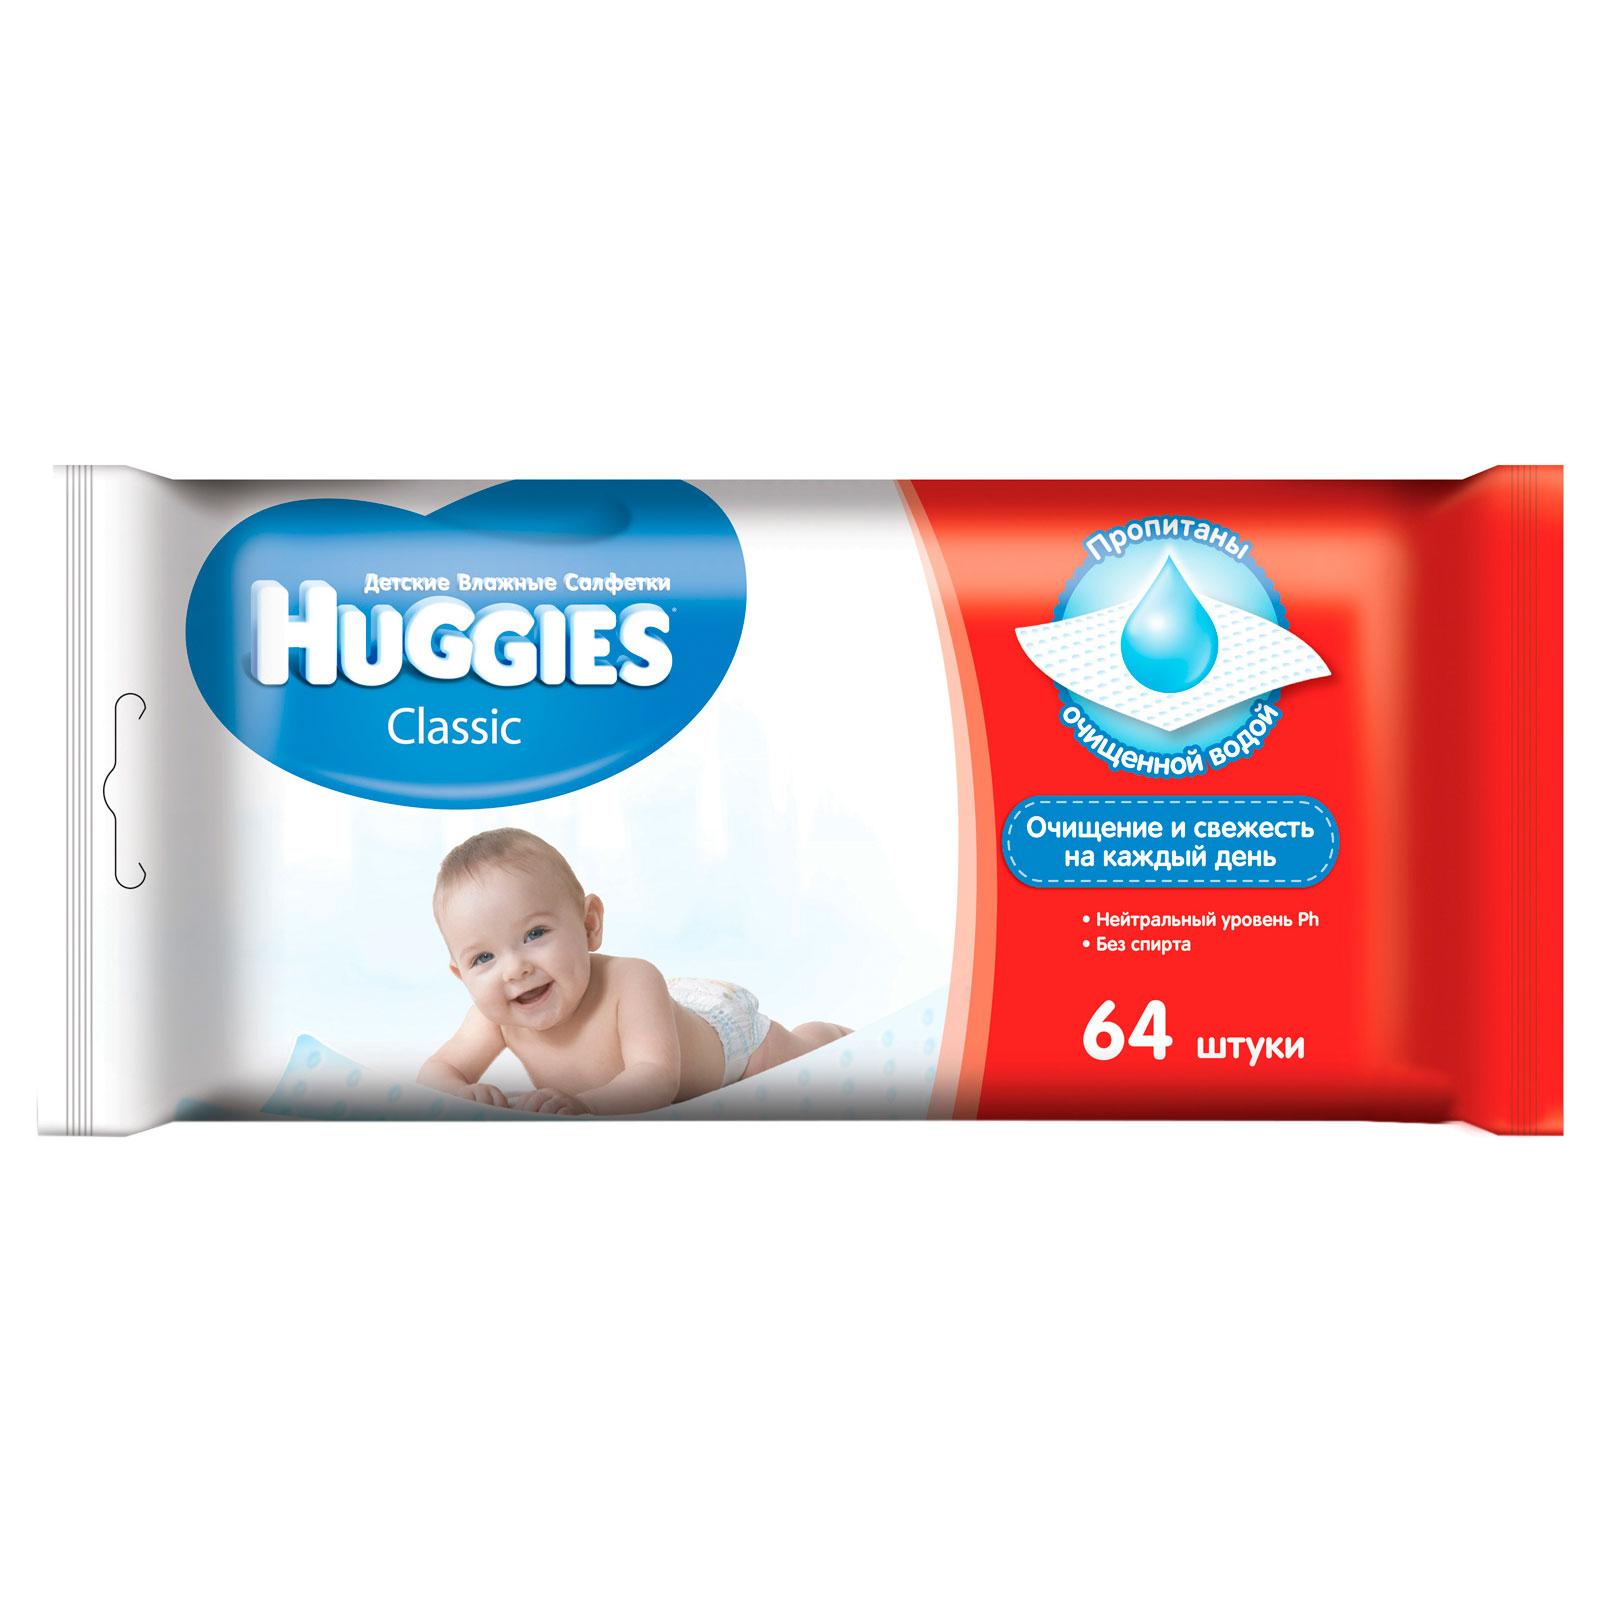 ����� Huggies � 8 ������ ���� �� ���������